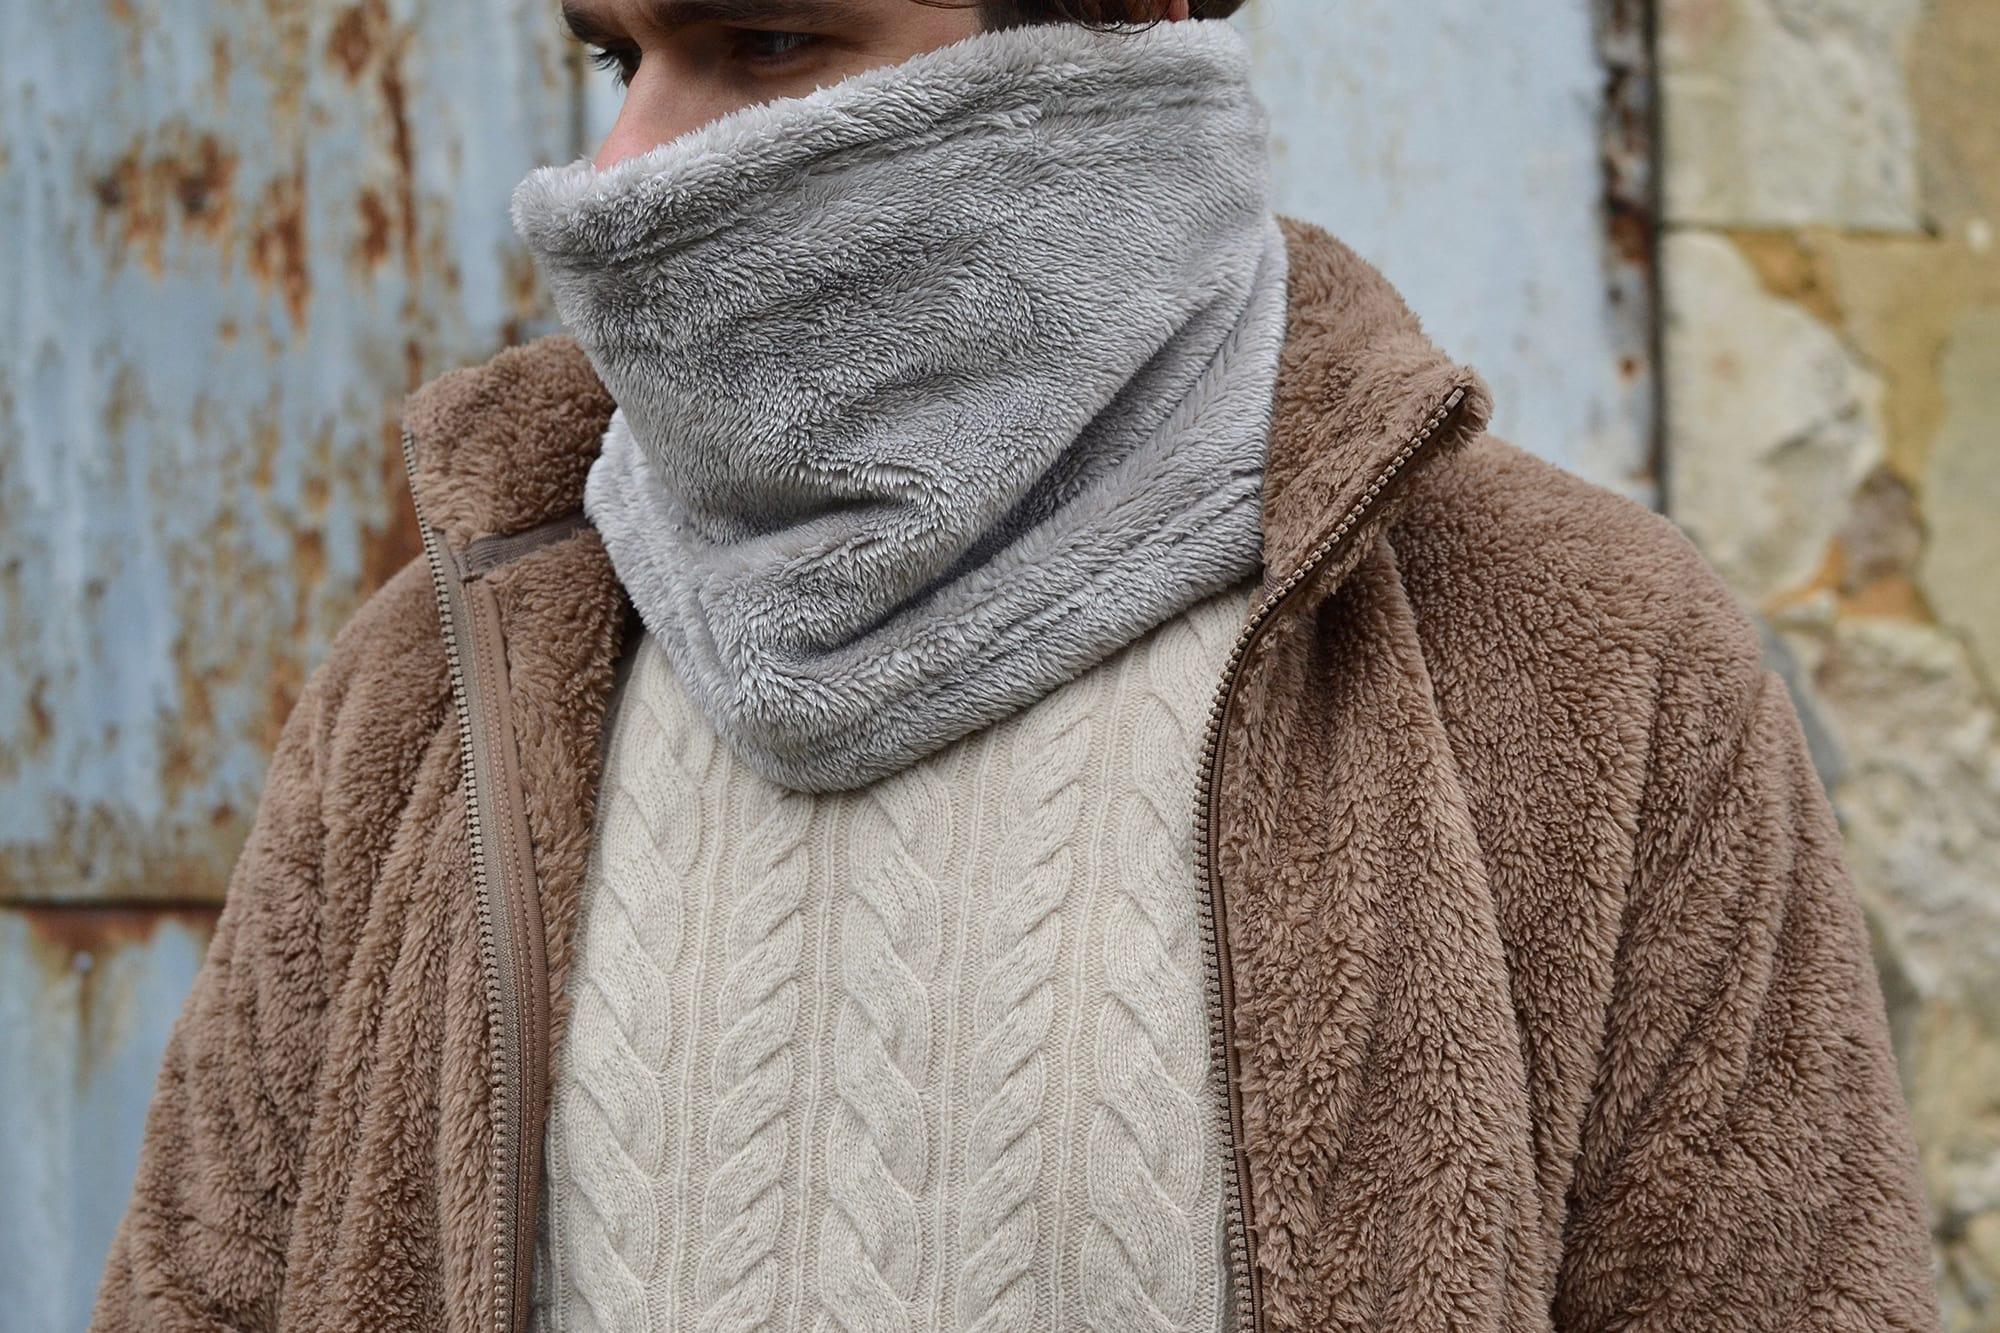 tour de cou pour homme Uniqlo en fleexe polaire